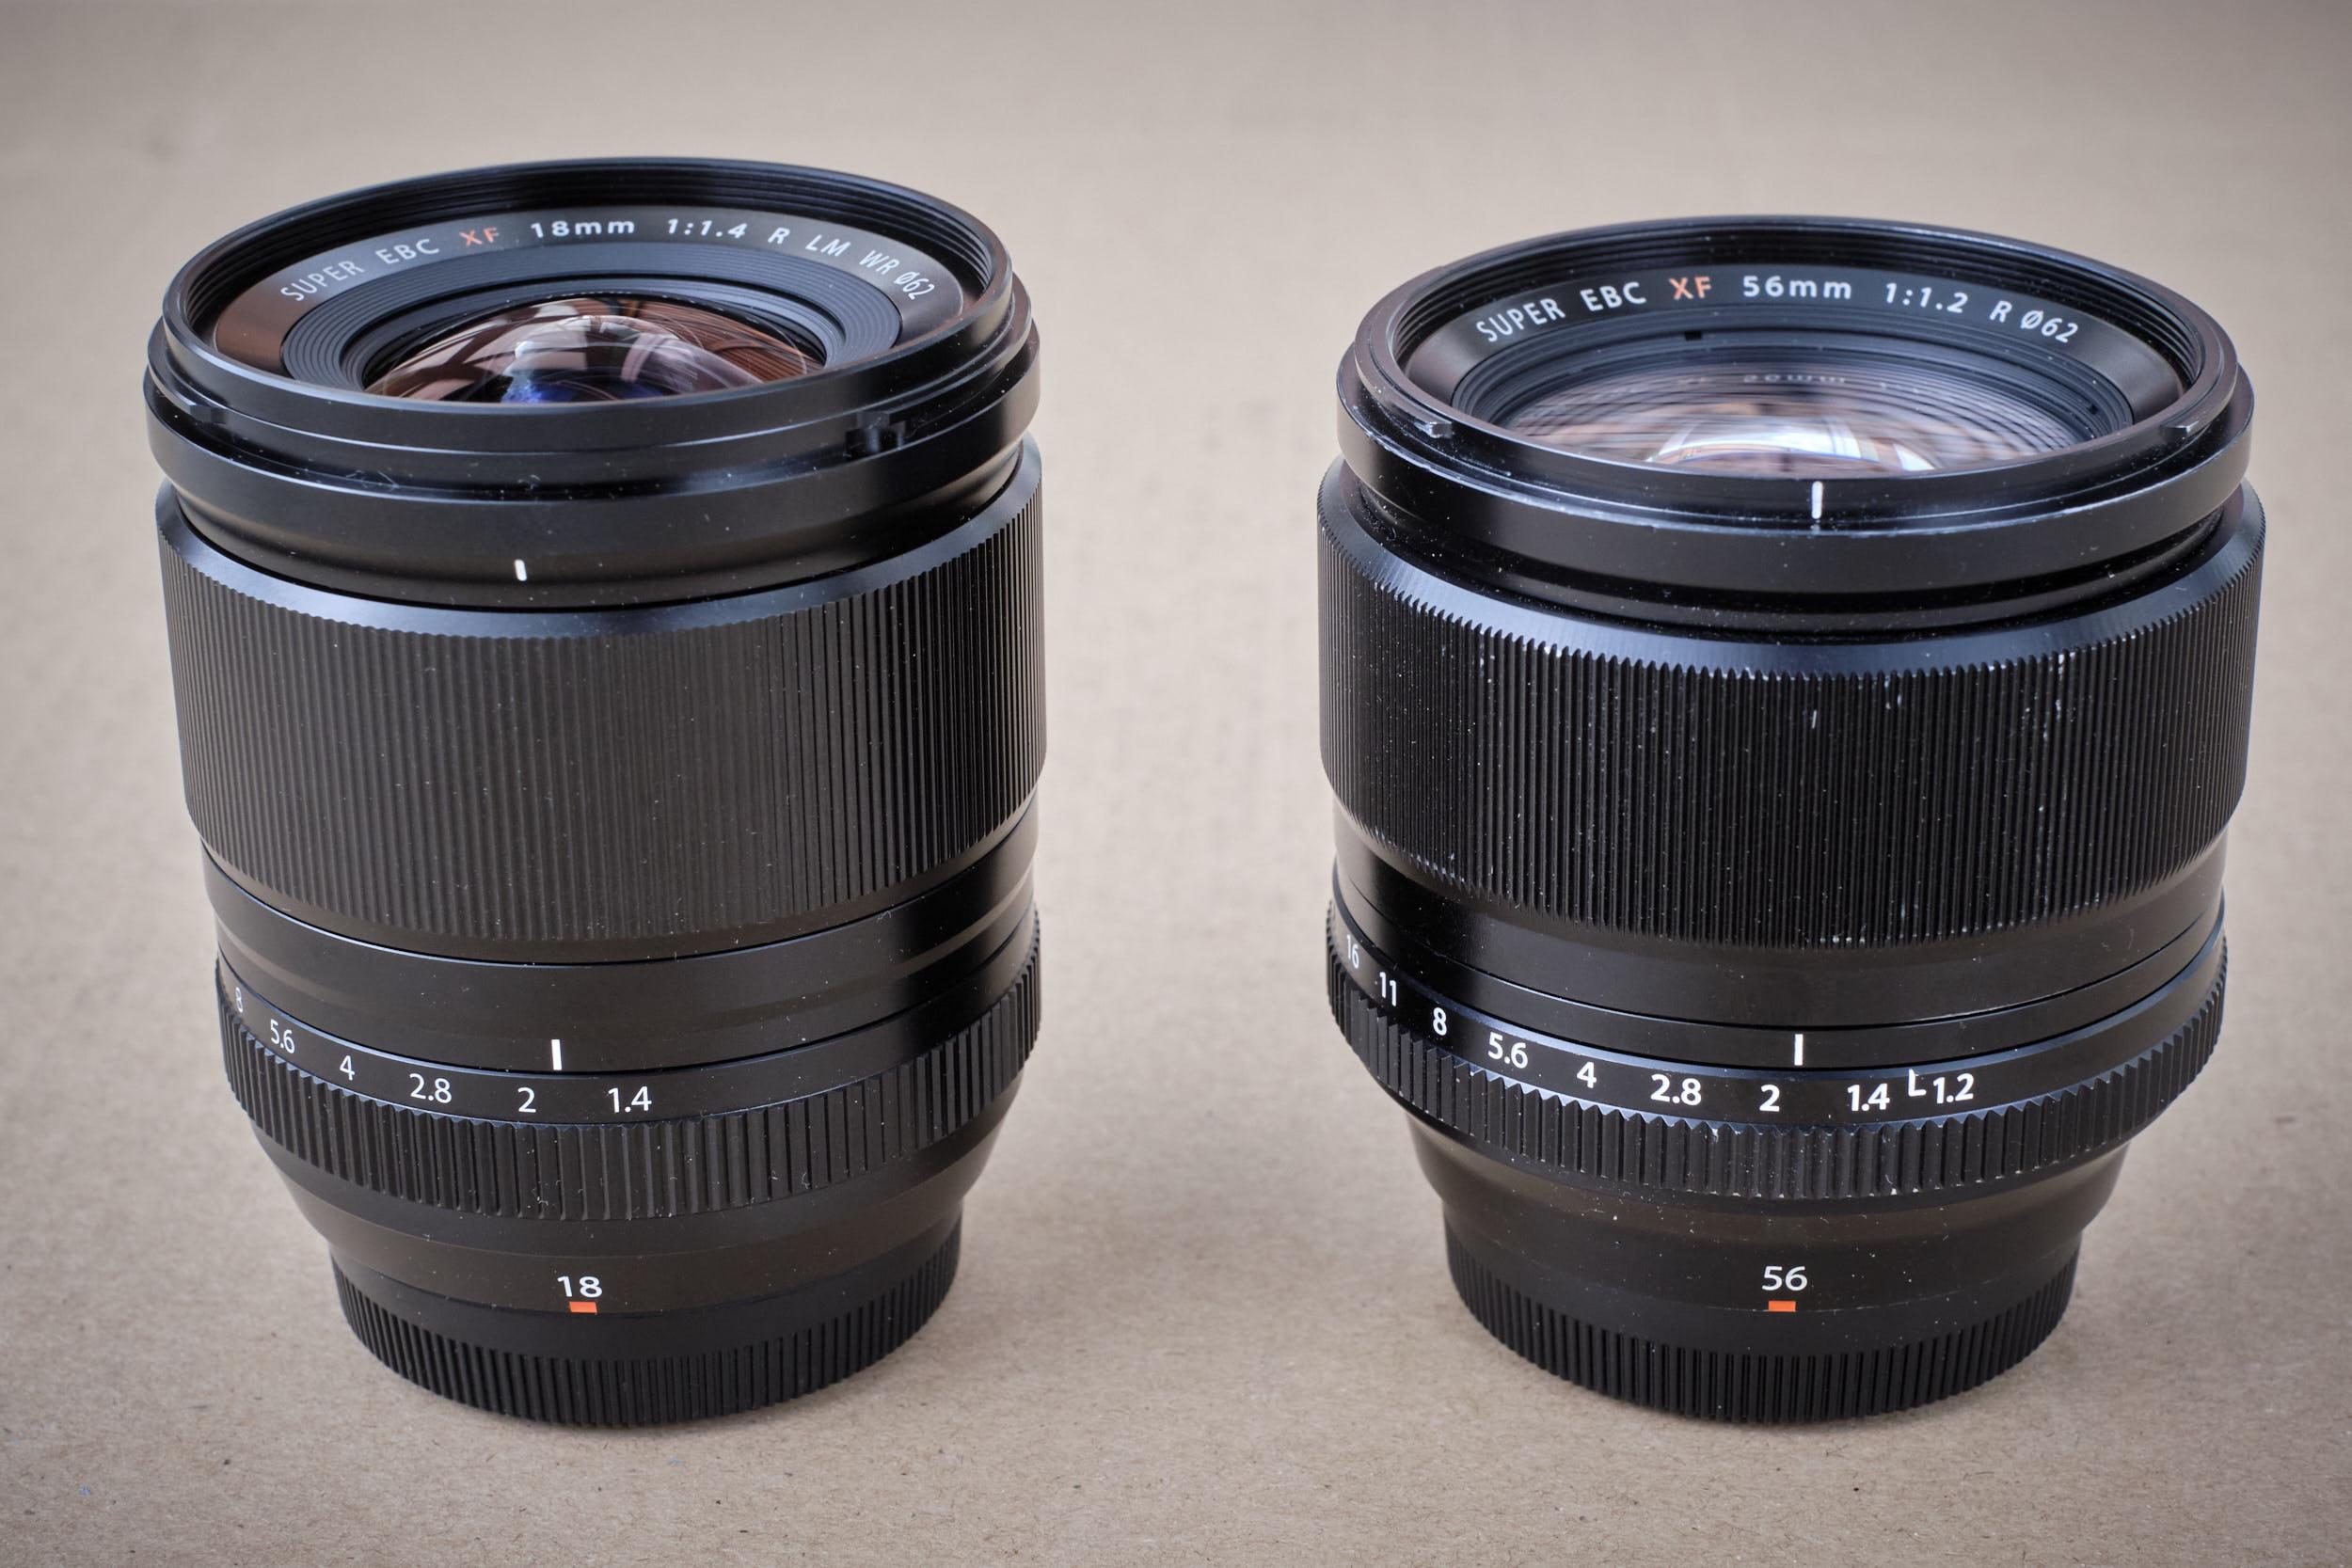 Größenvergleich XF18mm/f1.4 R LM WR  zum XF56mm/1.2 R